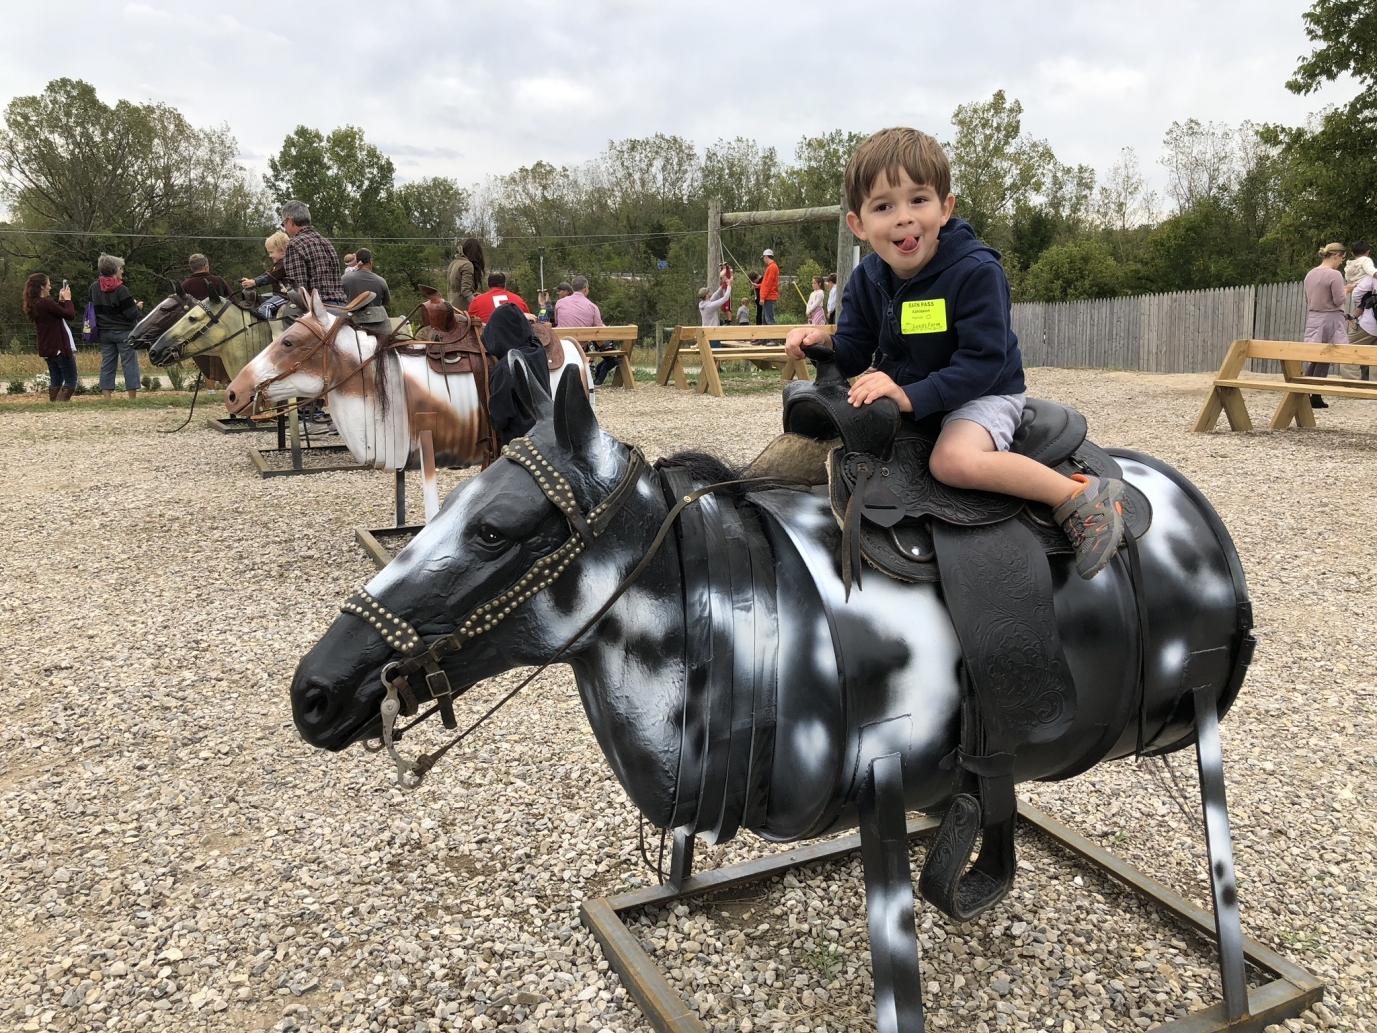 Leeds Farm Horse Corral